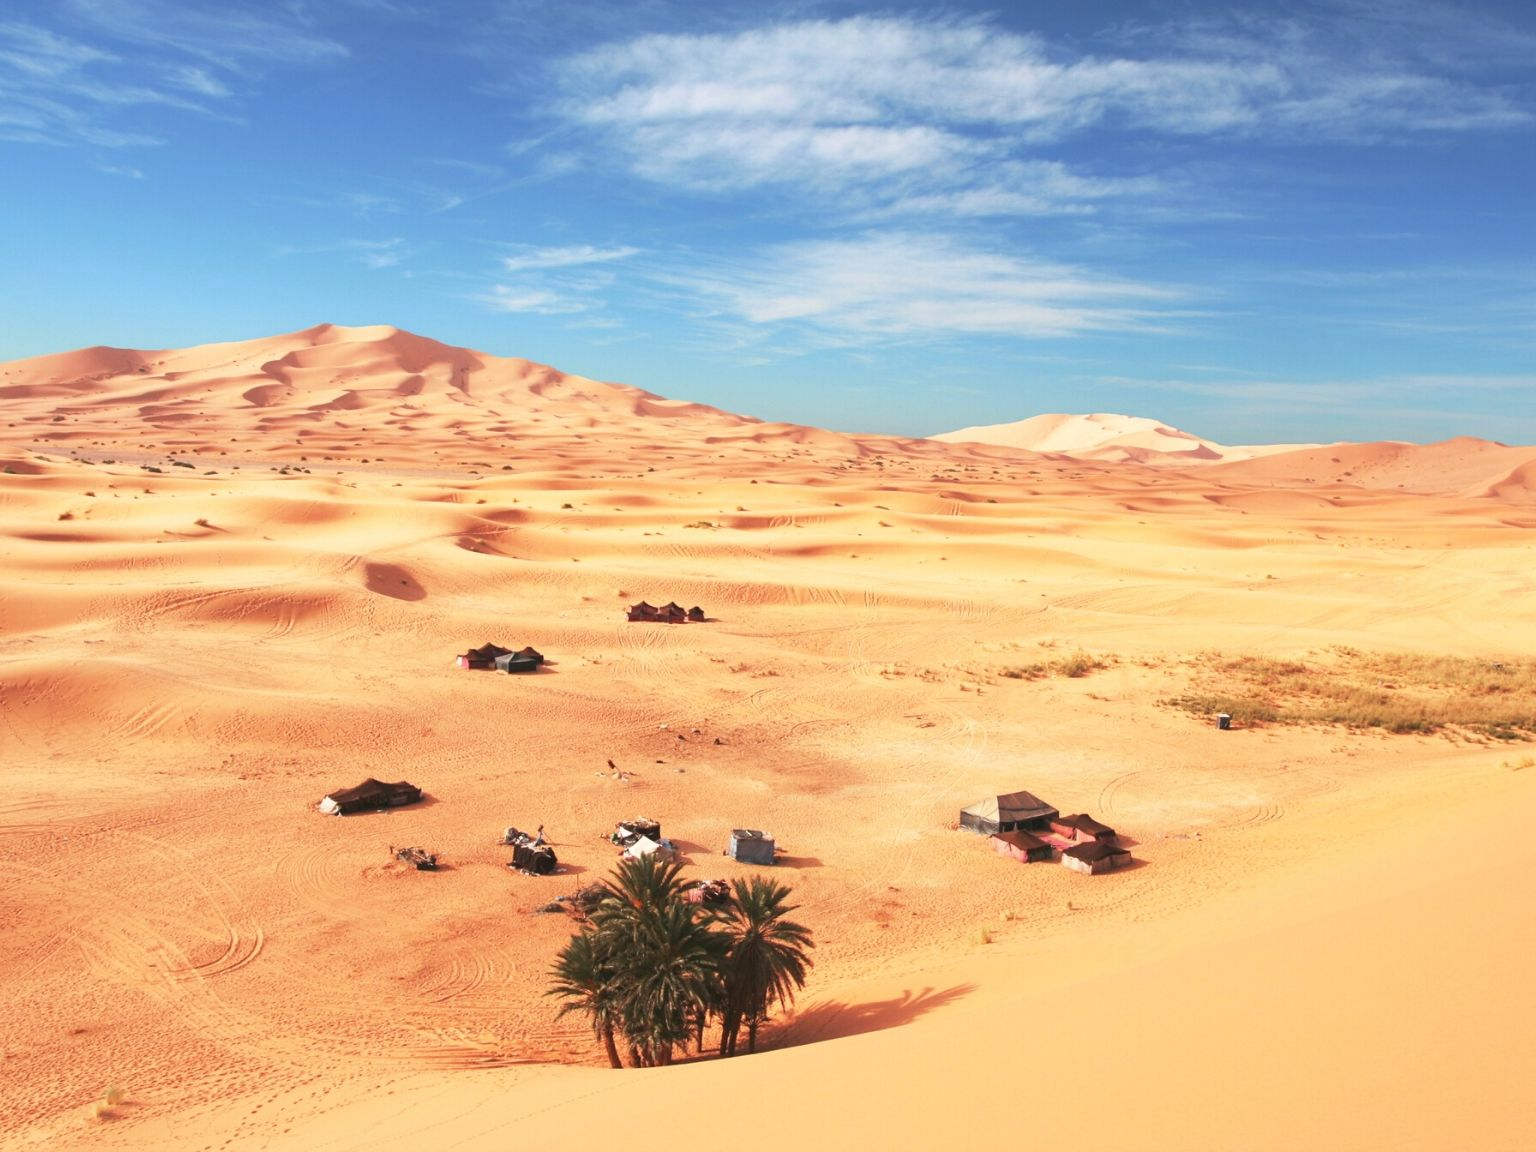 Fotos de Merzouga Marruecos